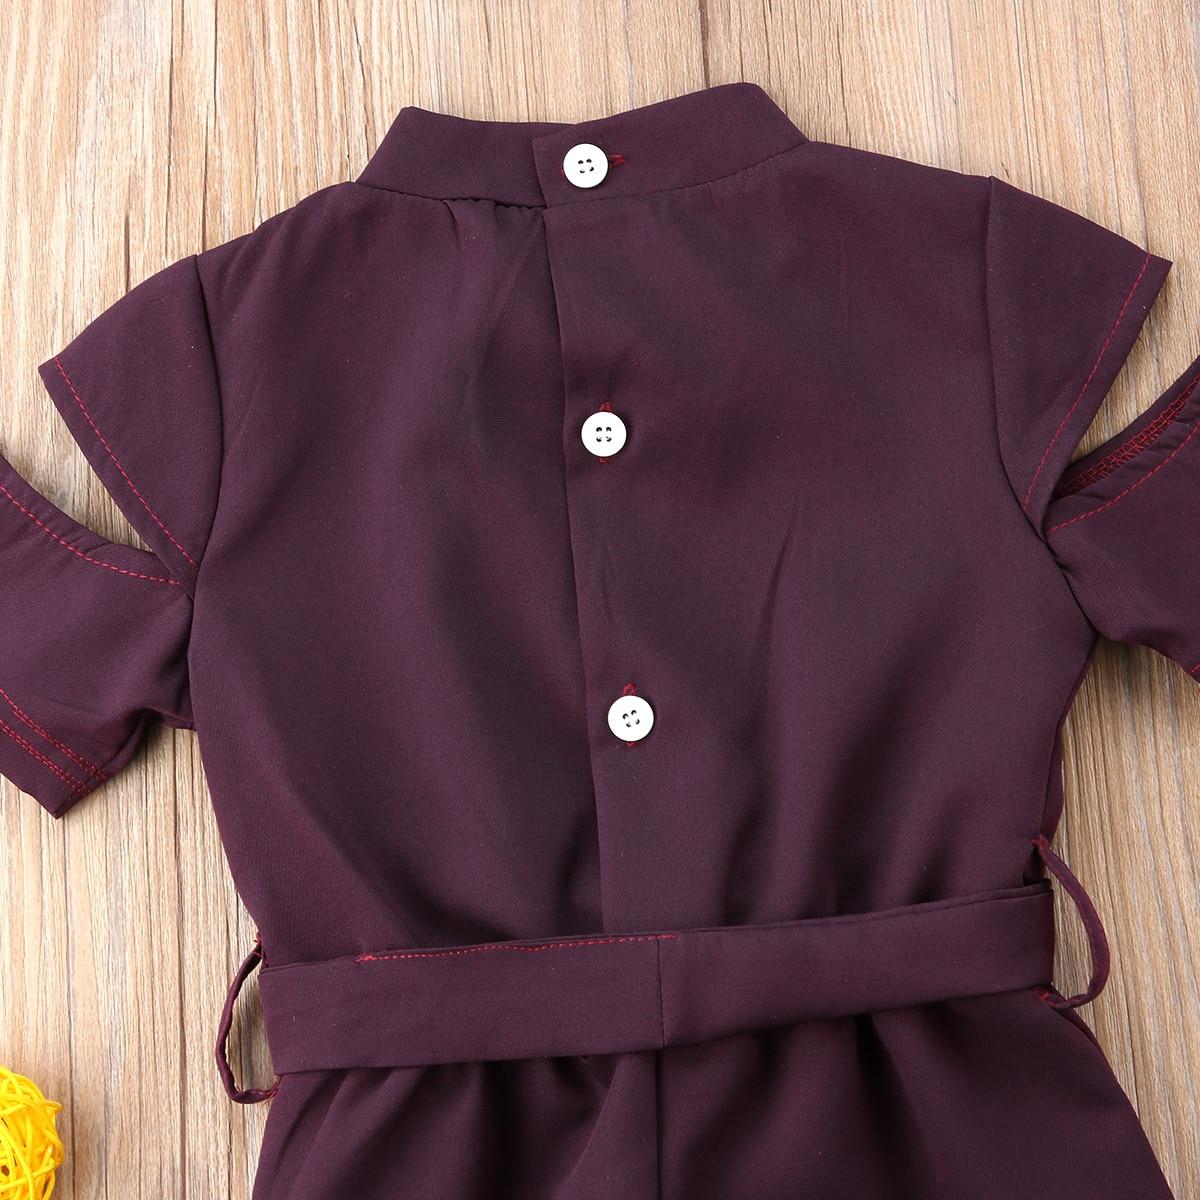 Trendy Kids Baby Girls Holes Romper Bodysuit Jumpsuit Outfits Clothes Playsuit